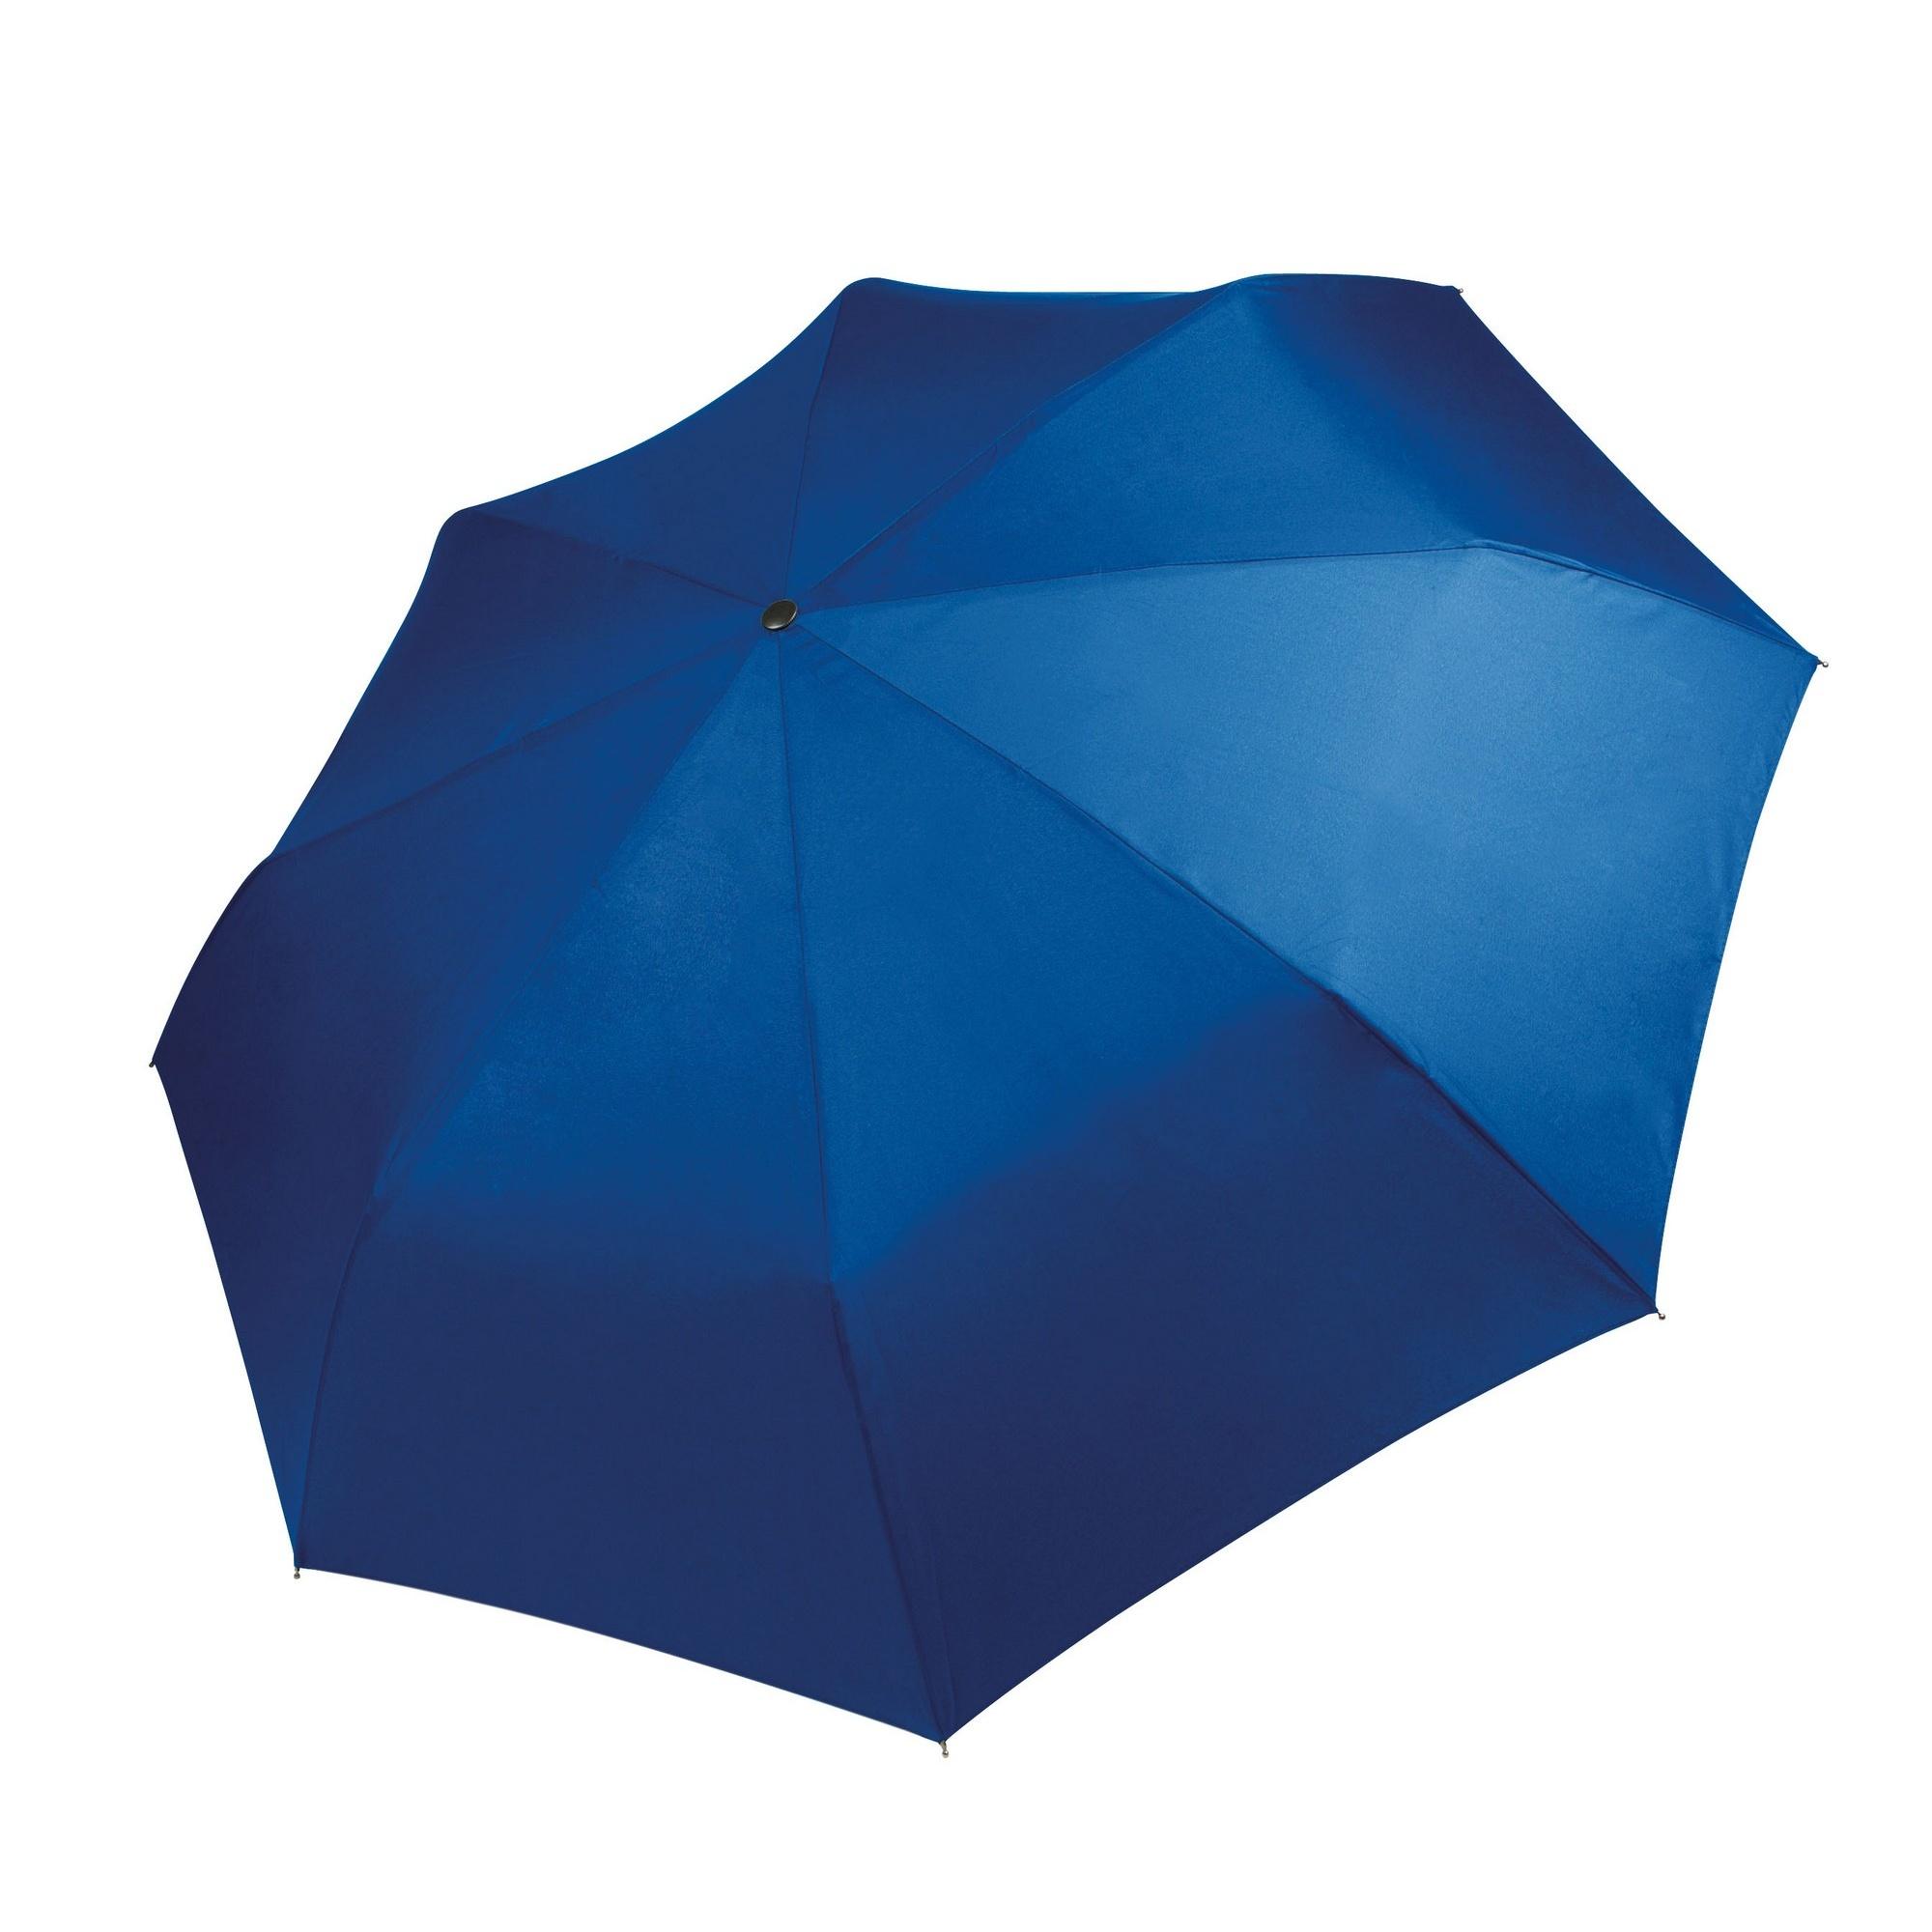 Kimood-Foldable-Handbag-Umbrella-RW5618